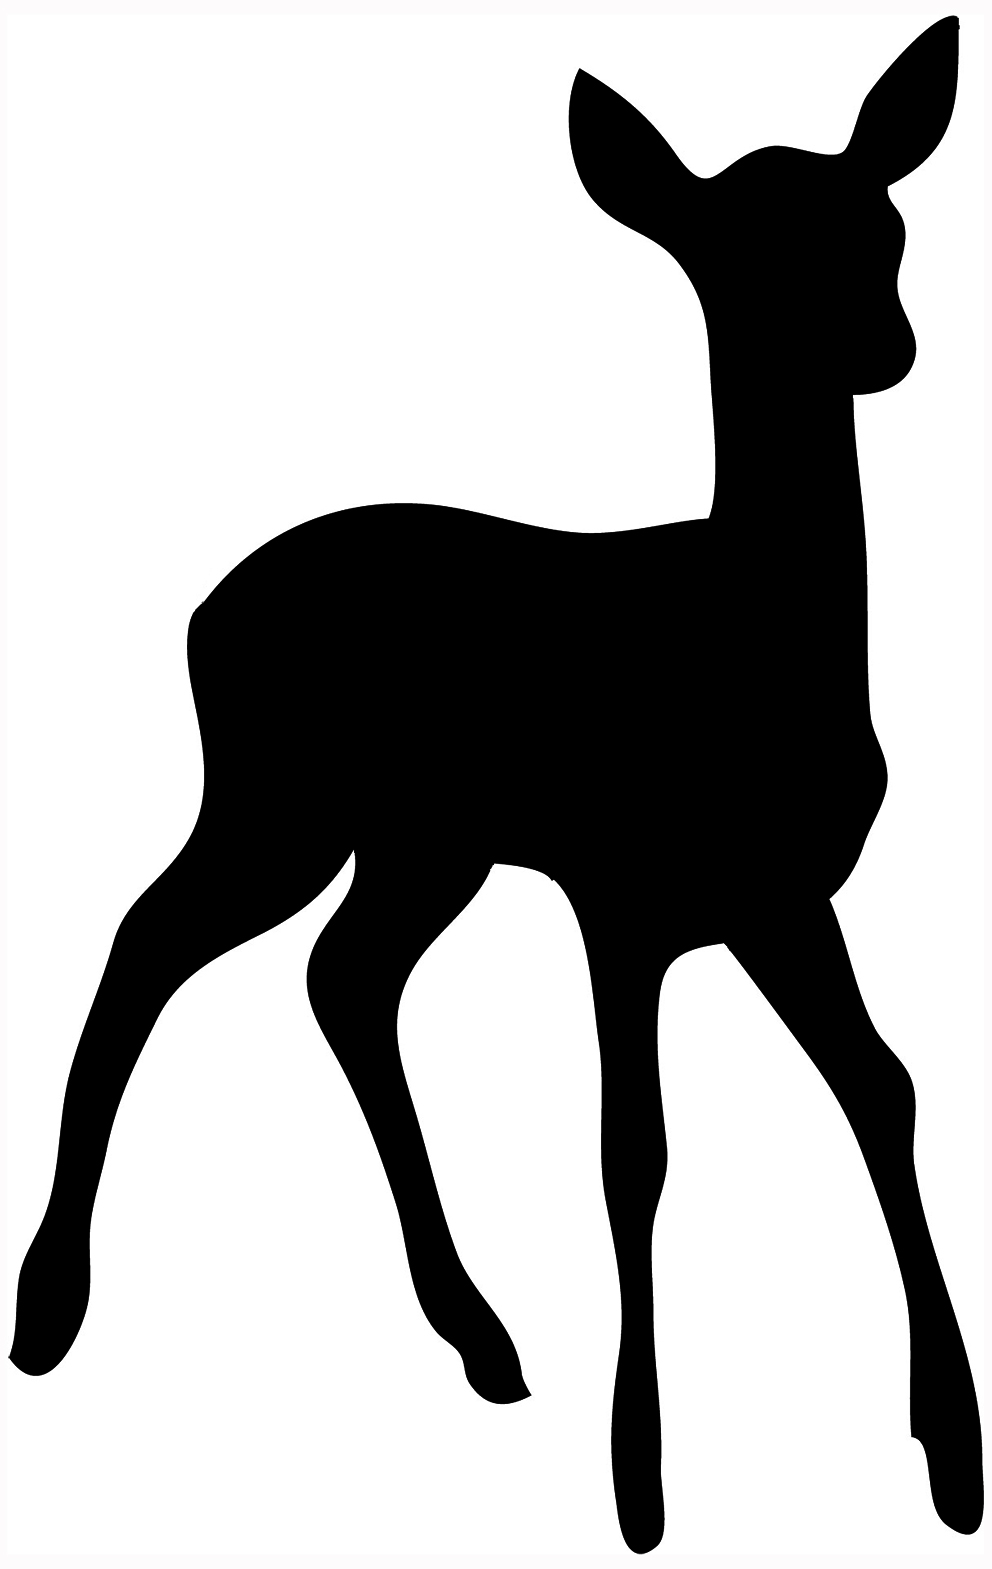 silhouette of stag, silhouette of young -silhouette of stag, silhouette of young deer-9